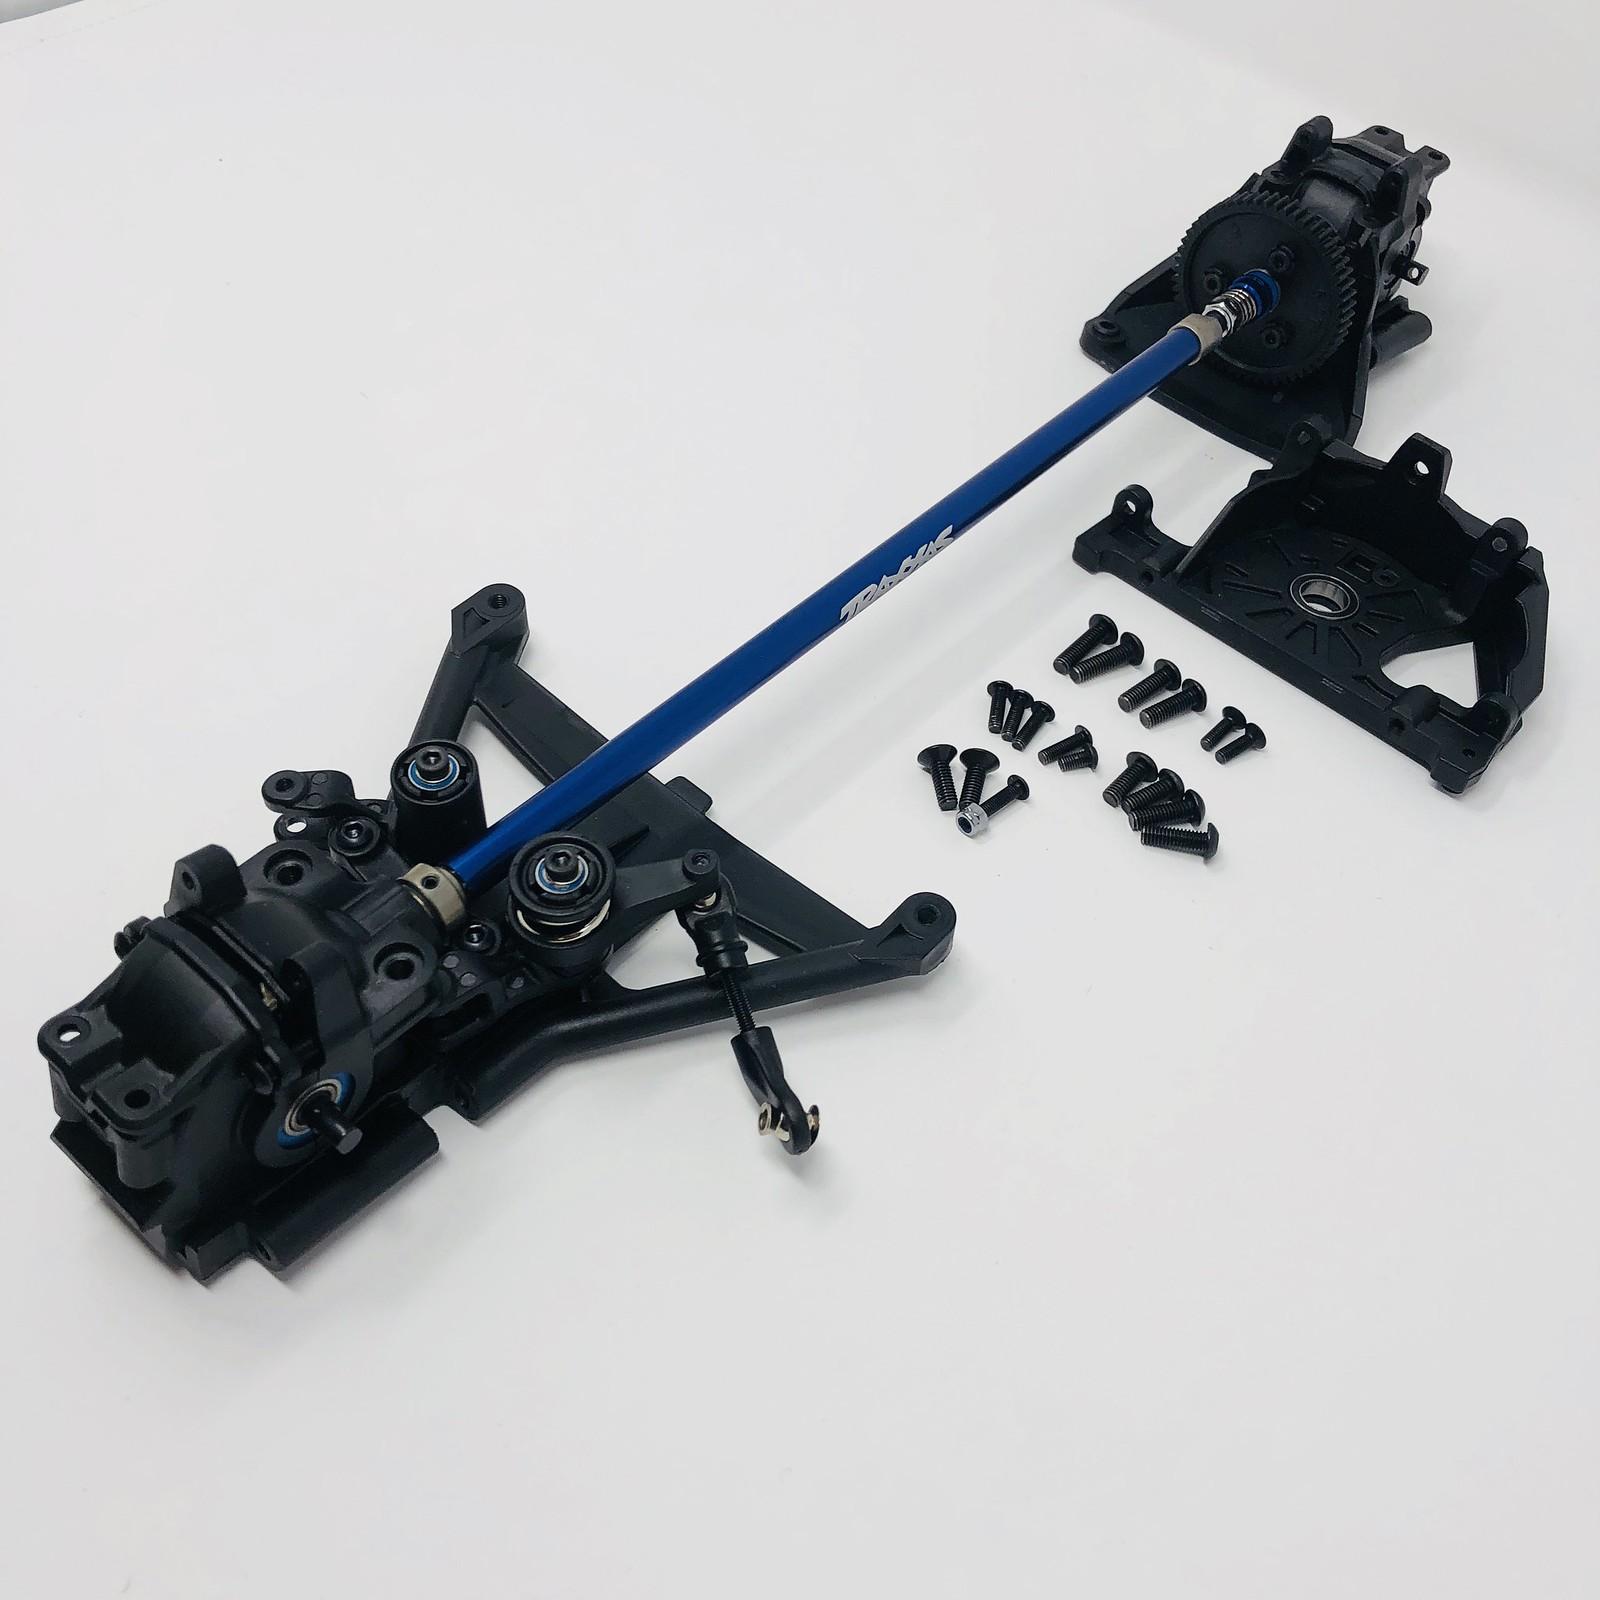 Traxxas Complete Front Gearbox E-Revo 2.0 VXL Rear Diff /& Centre Driveshaft